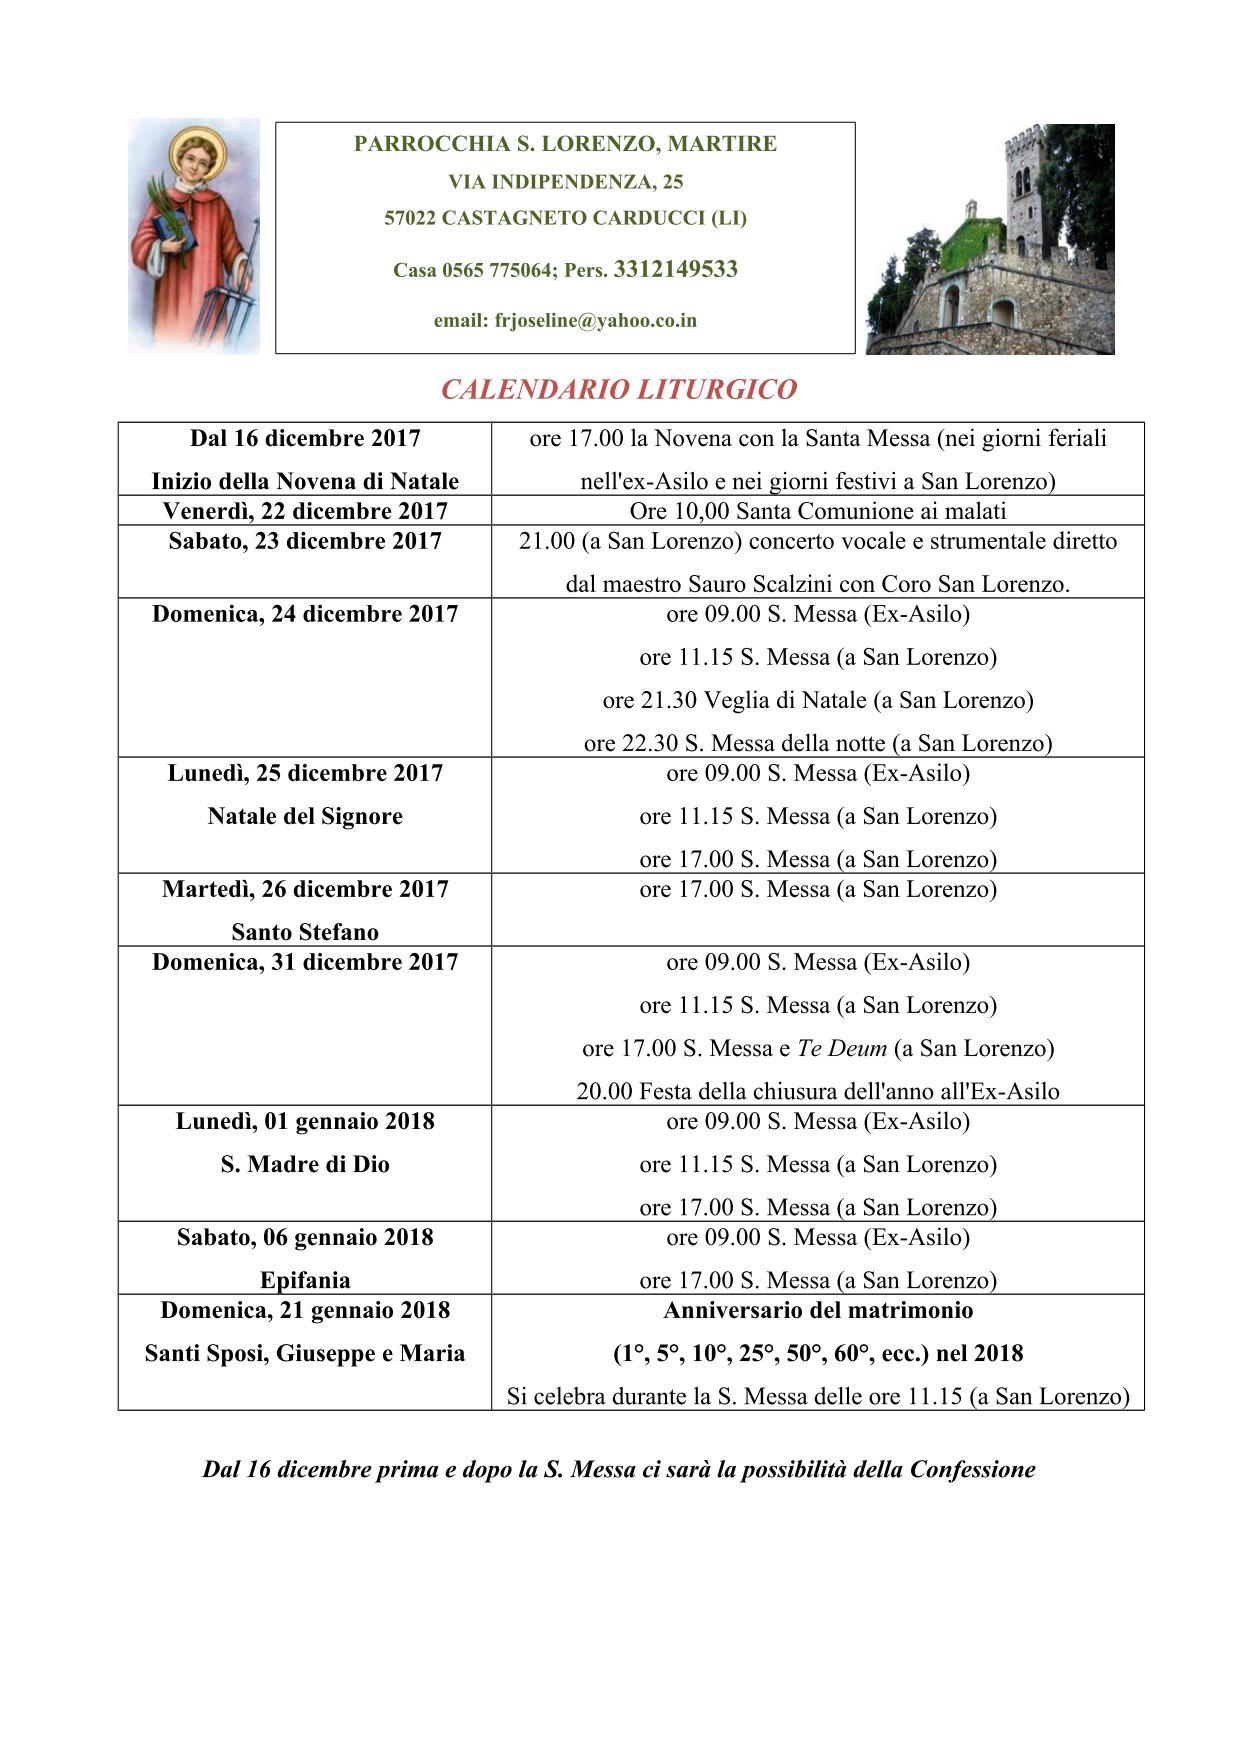 CALENDARIO LITURGICO dic2017-gen2018 San Lorenzo